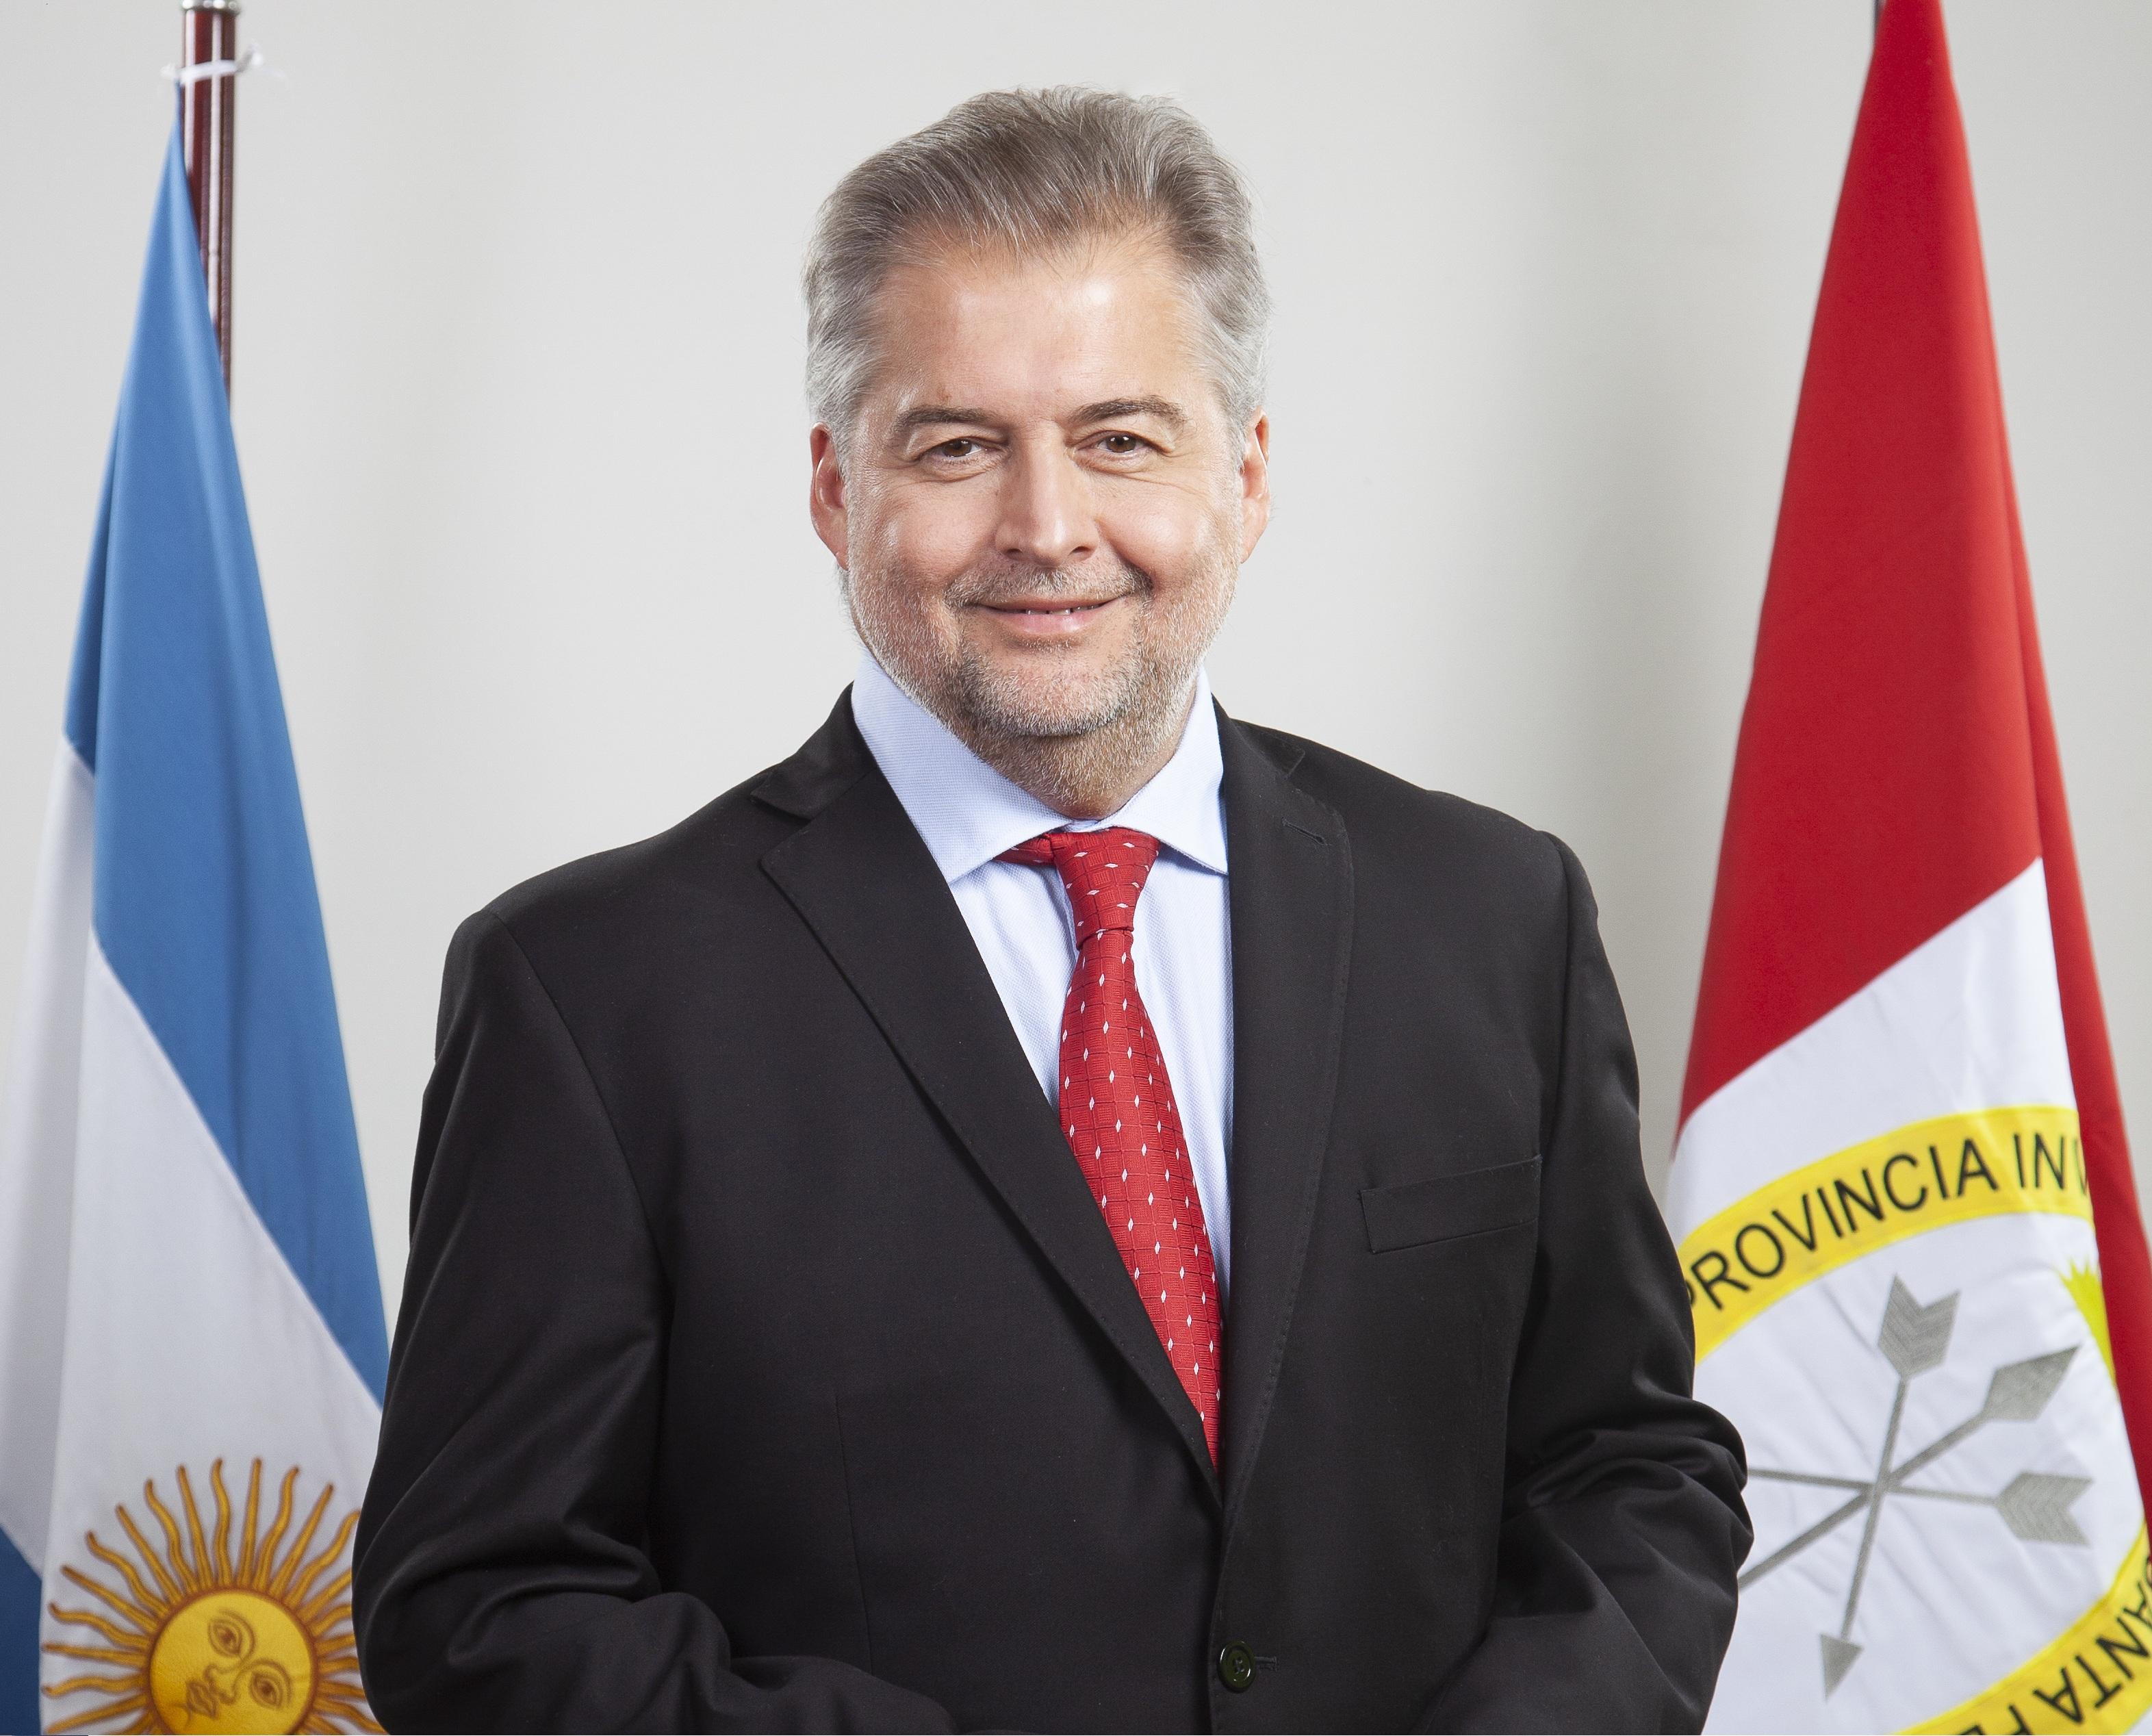 Roberto_Mirabella